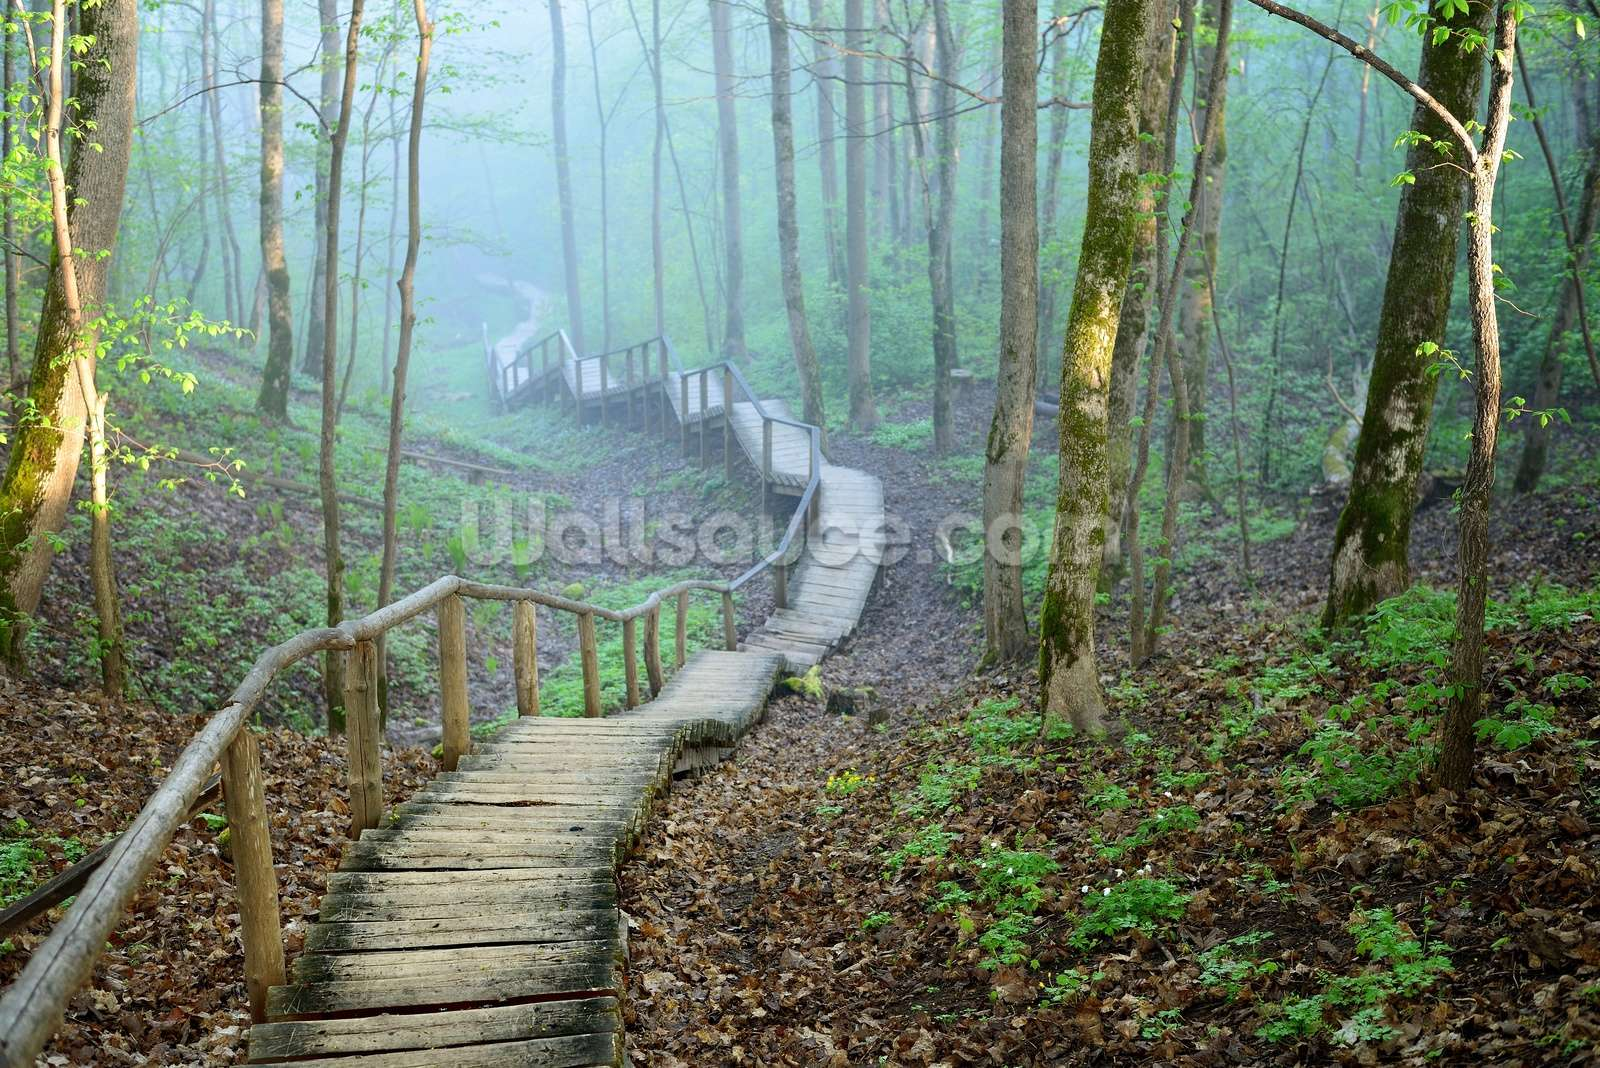 Foggy Forest Stairway Wallpaper Mural